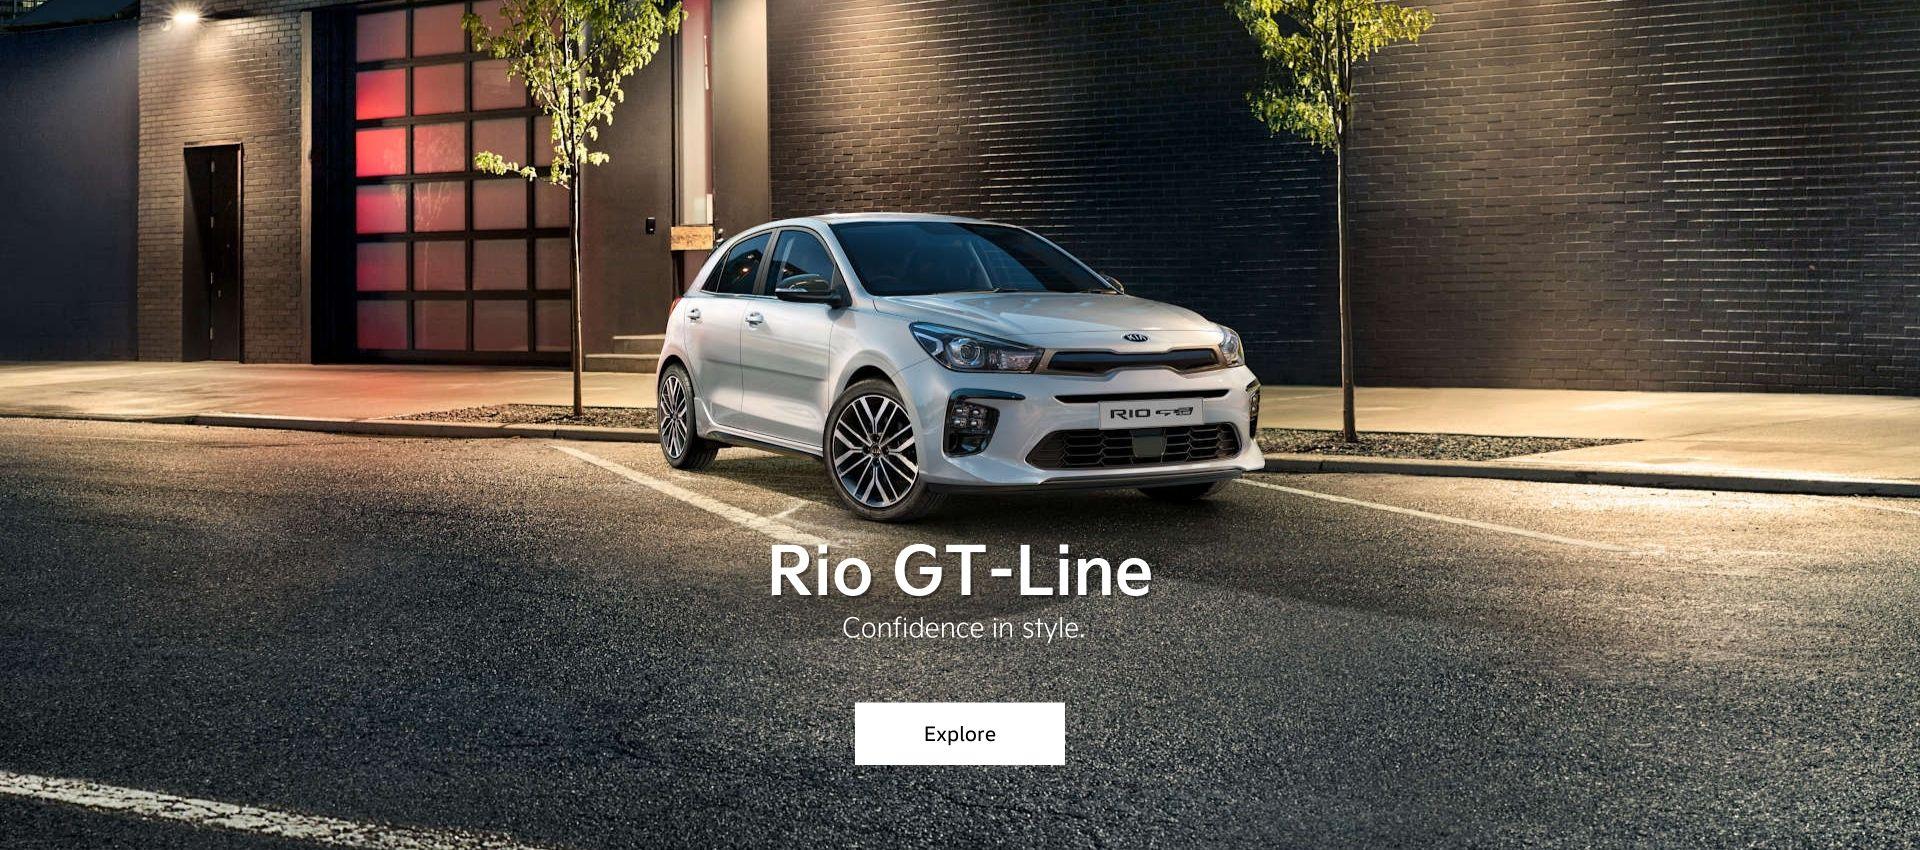 Rio GT-Line